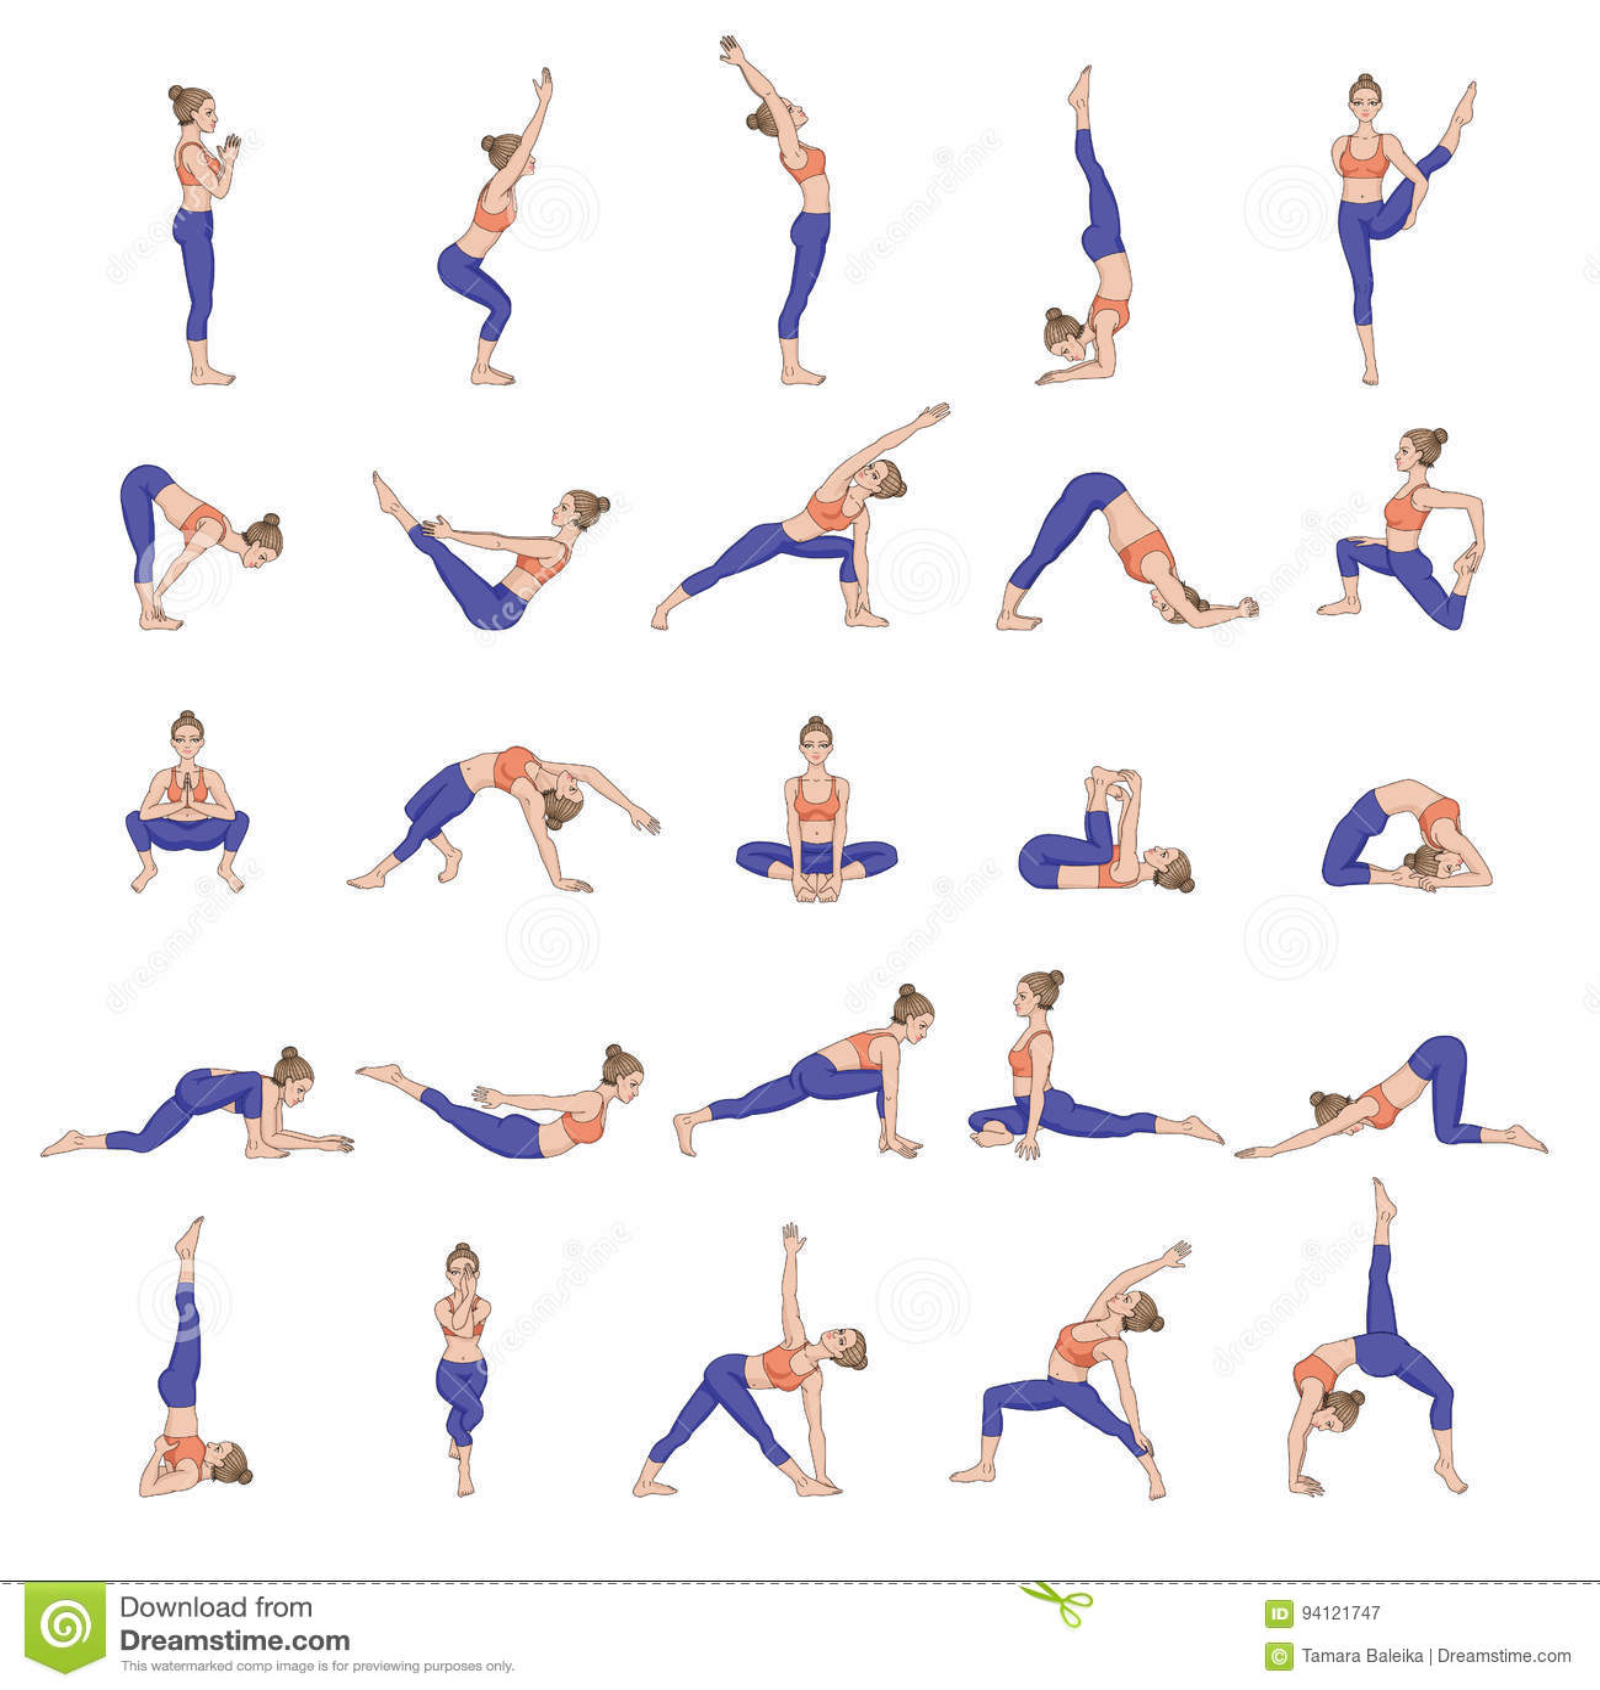 Yoga Poses For Women